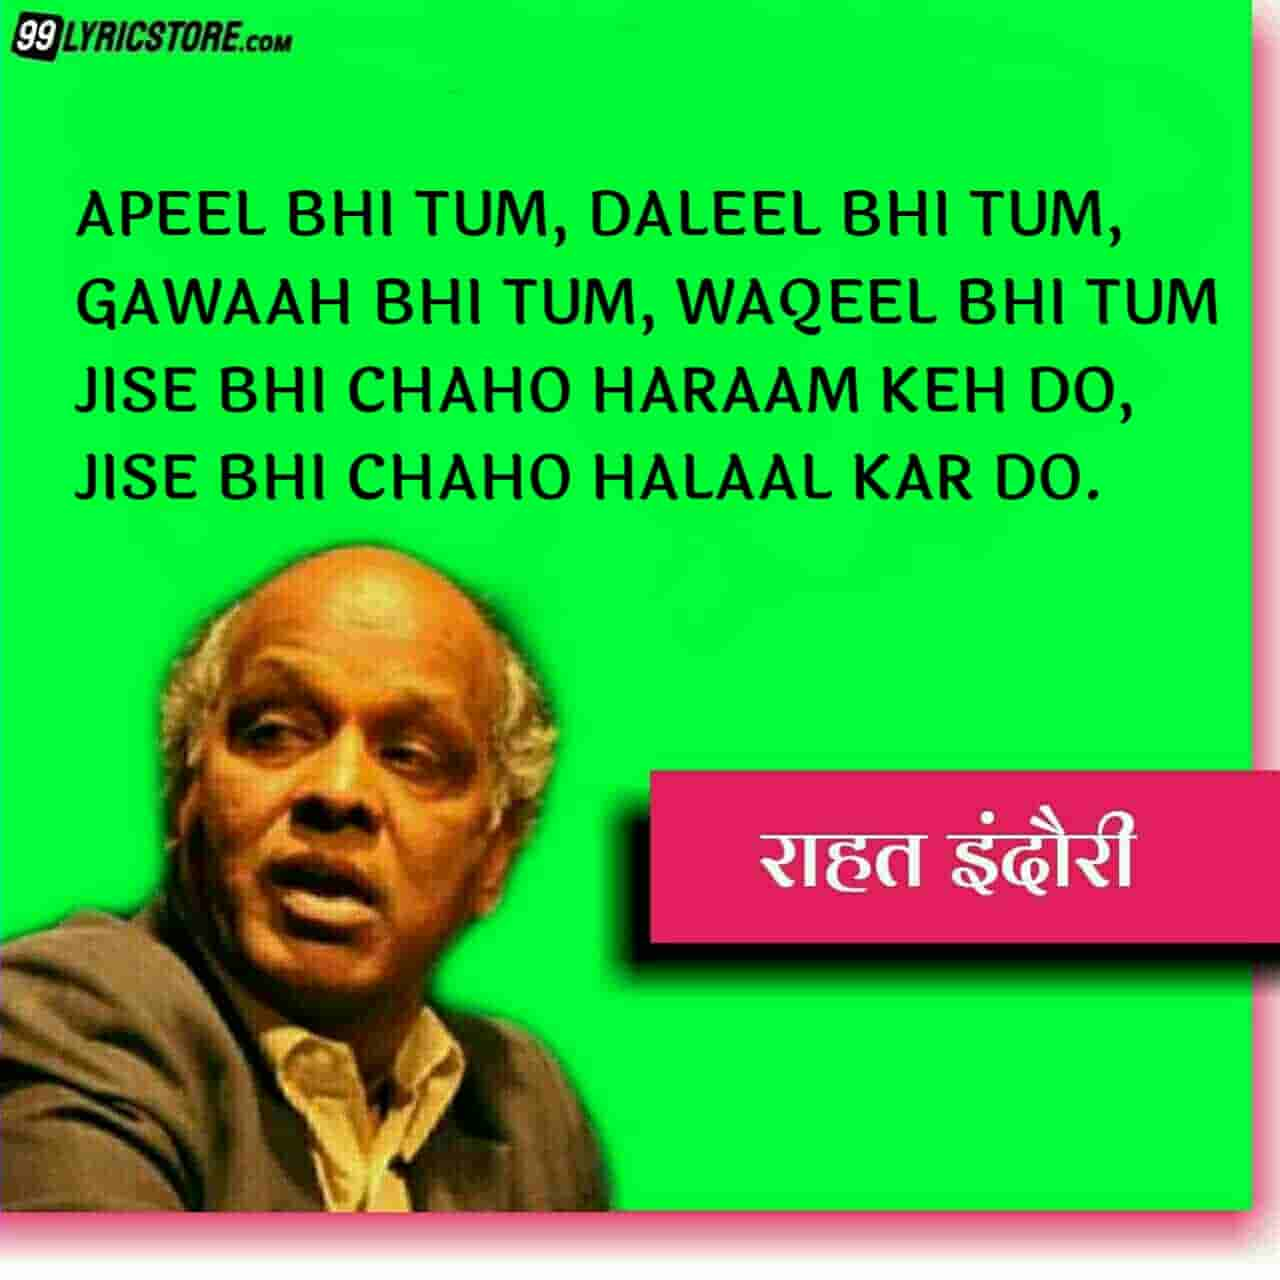 This beautiful ghazal 'Jidhar Se Guzro Dhuaan Bichha Do' has written and performed by Rahat Indori.